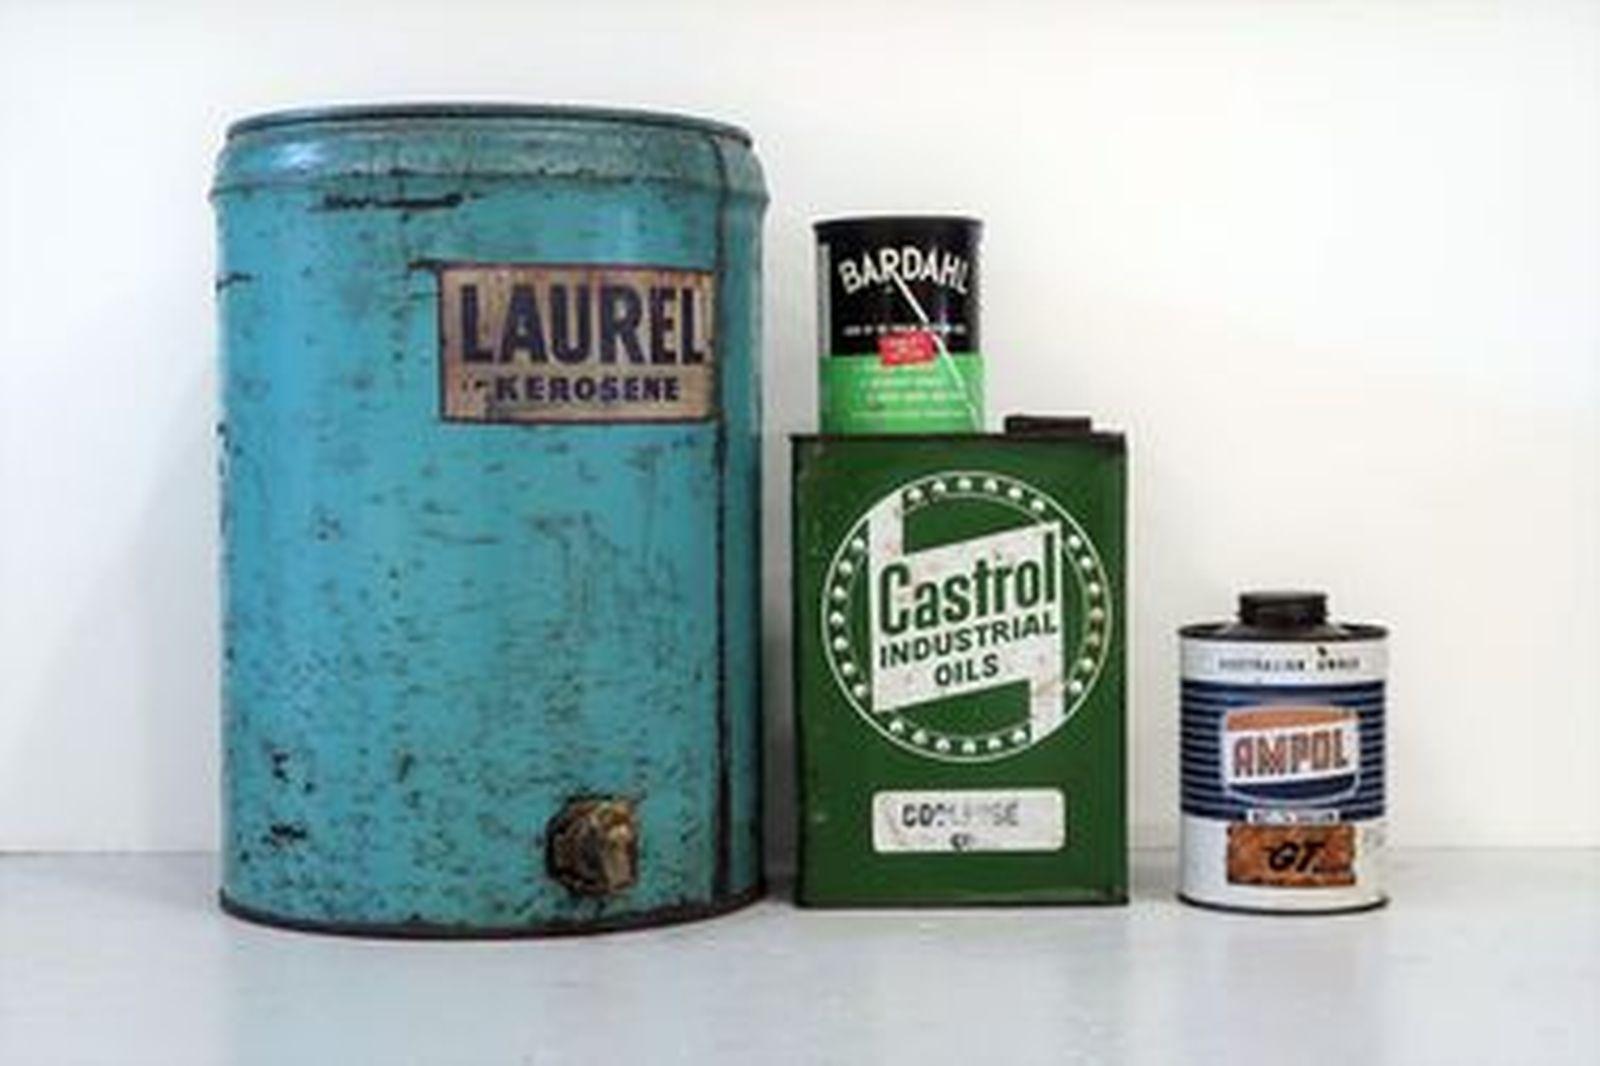 Oil Cans - 4 x Assorted Small Oil Cans (Castrol, Ampol, Bardahl, Laurel Kerosene)